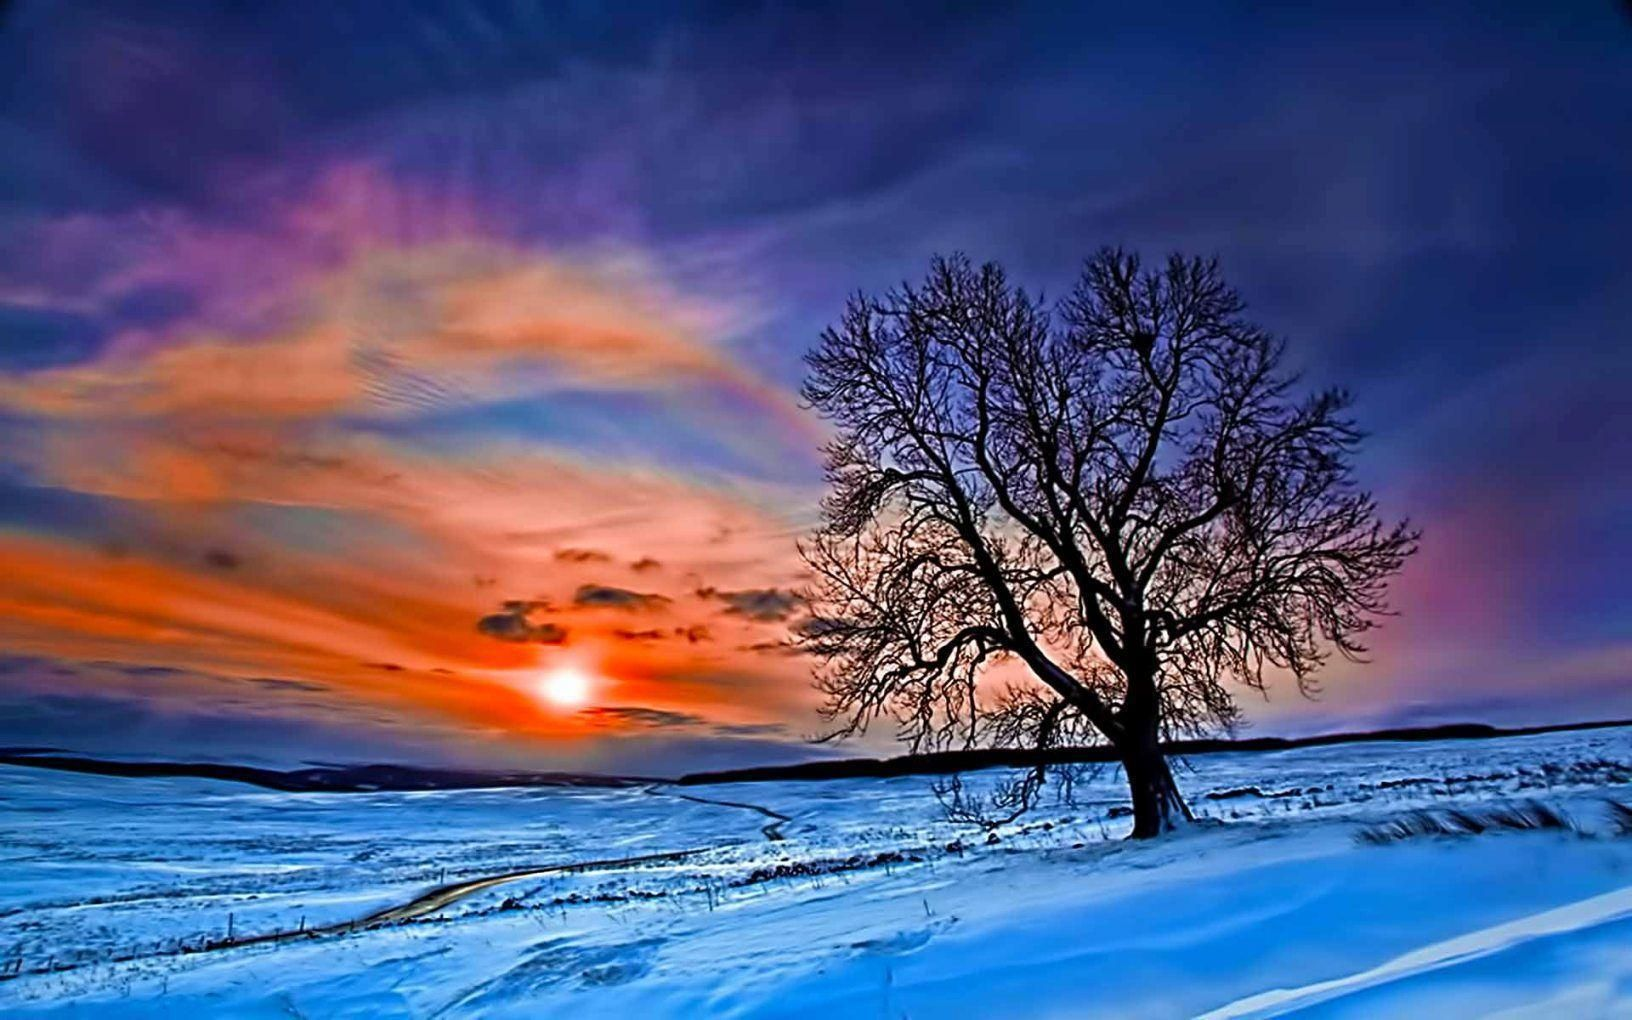 Winter Nature Wallpaper Download Free Pixelstalk Net Winter Sunset Winter Sunrise Winter Nature